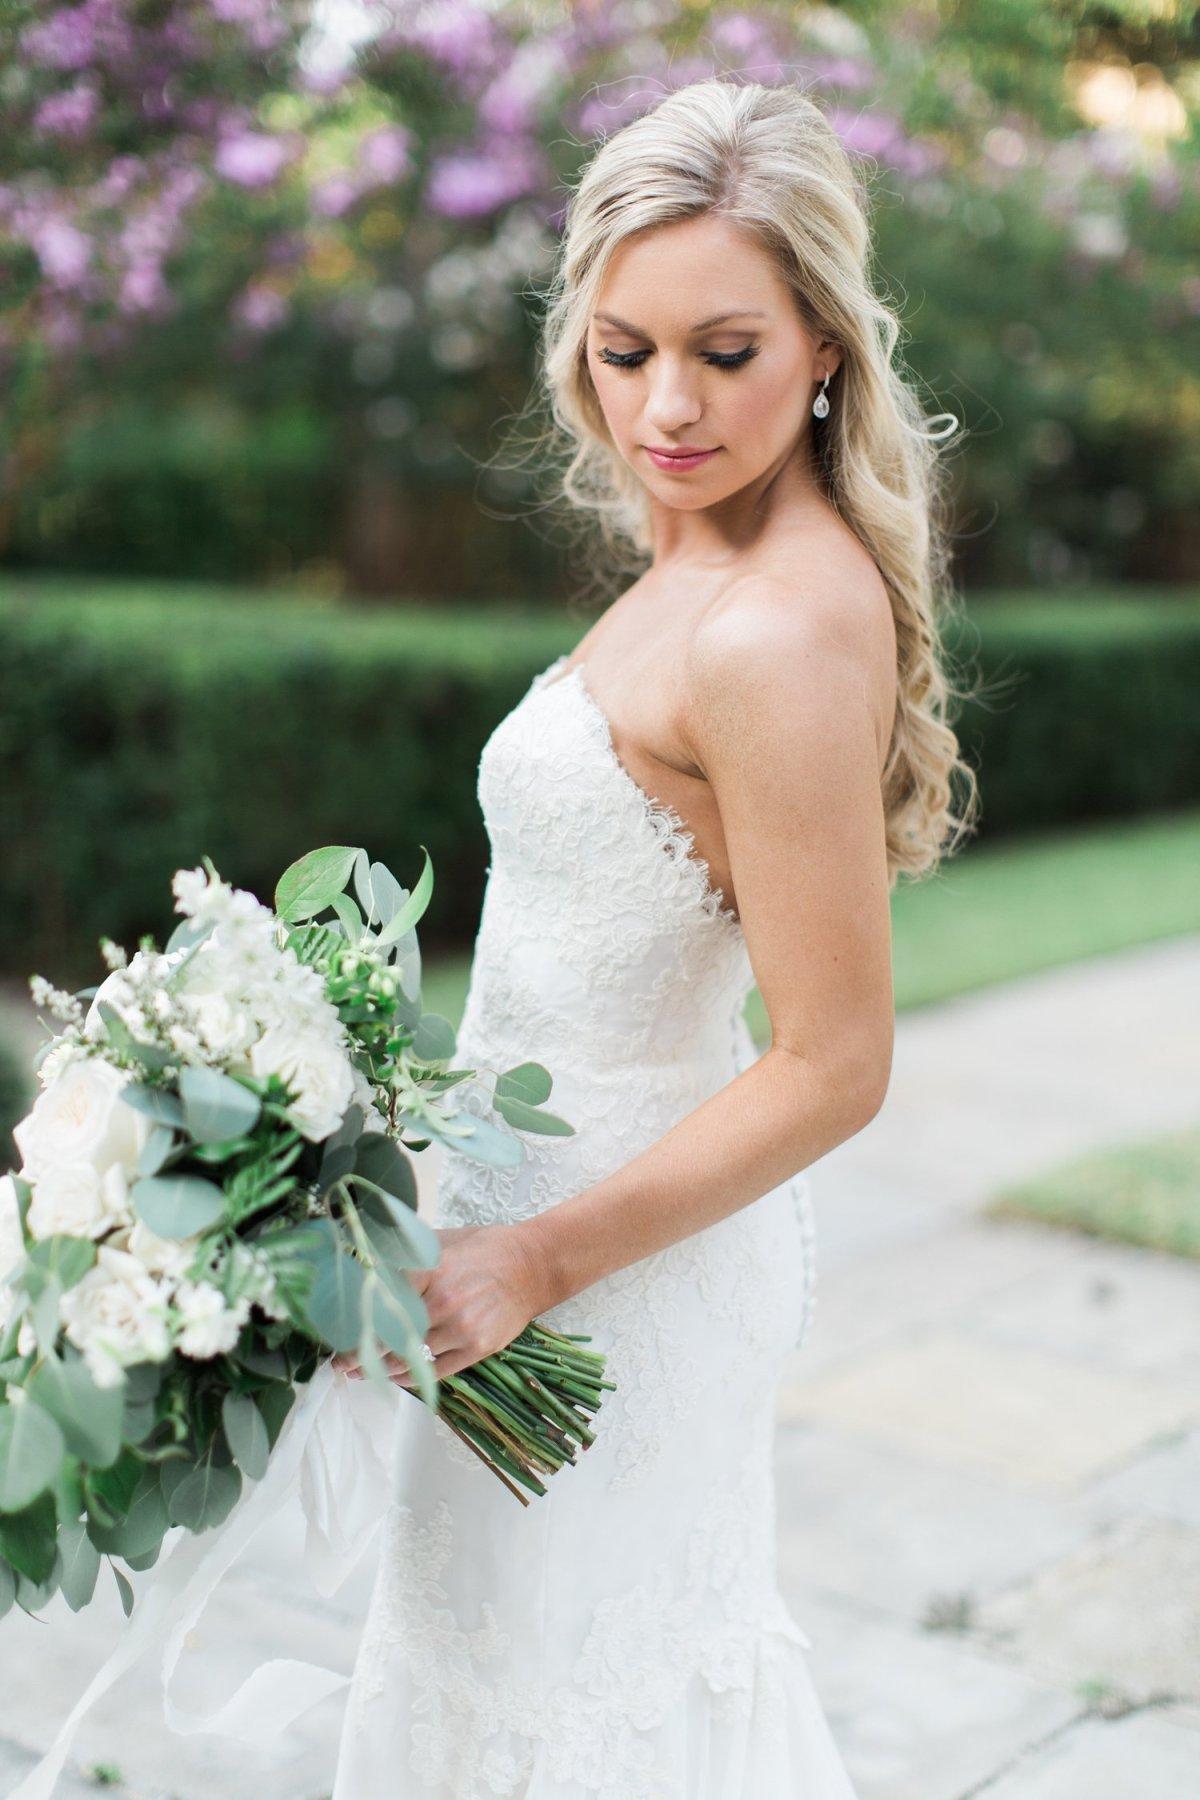 dallas-bridal-wedding-portrait-photographer-aldredge-house-emily-6.jpg